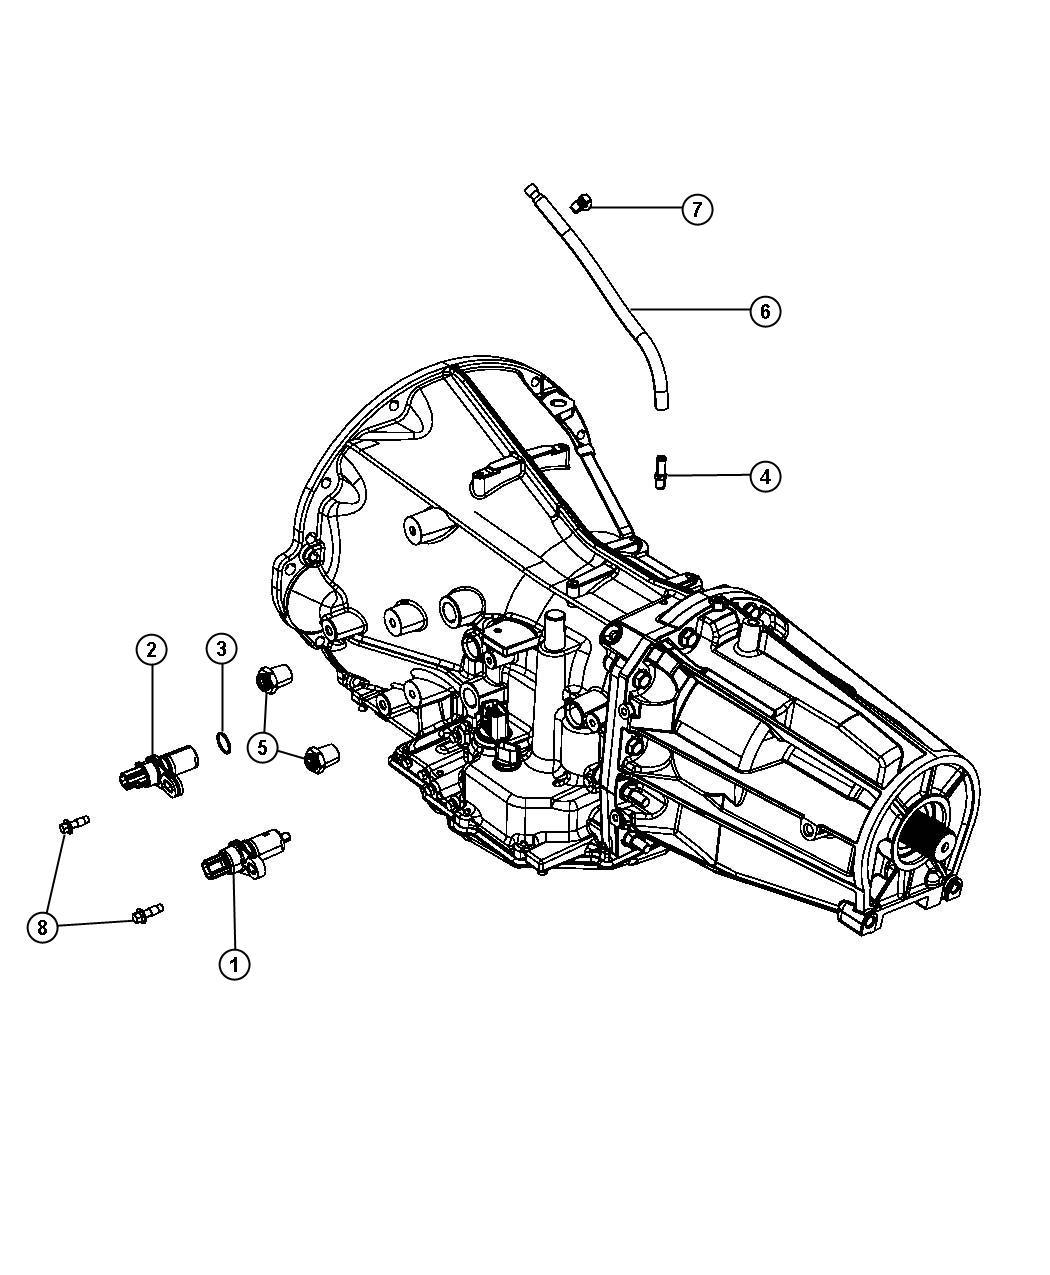 Chrysler 300 Sensors Vents And Quick Connectors